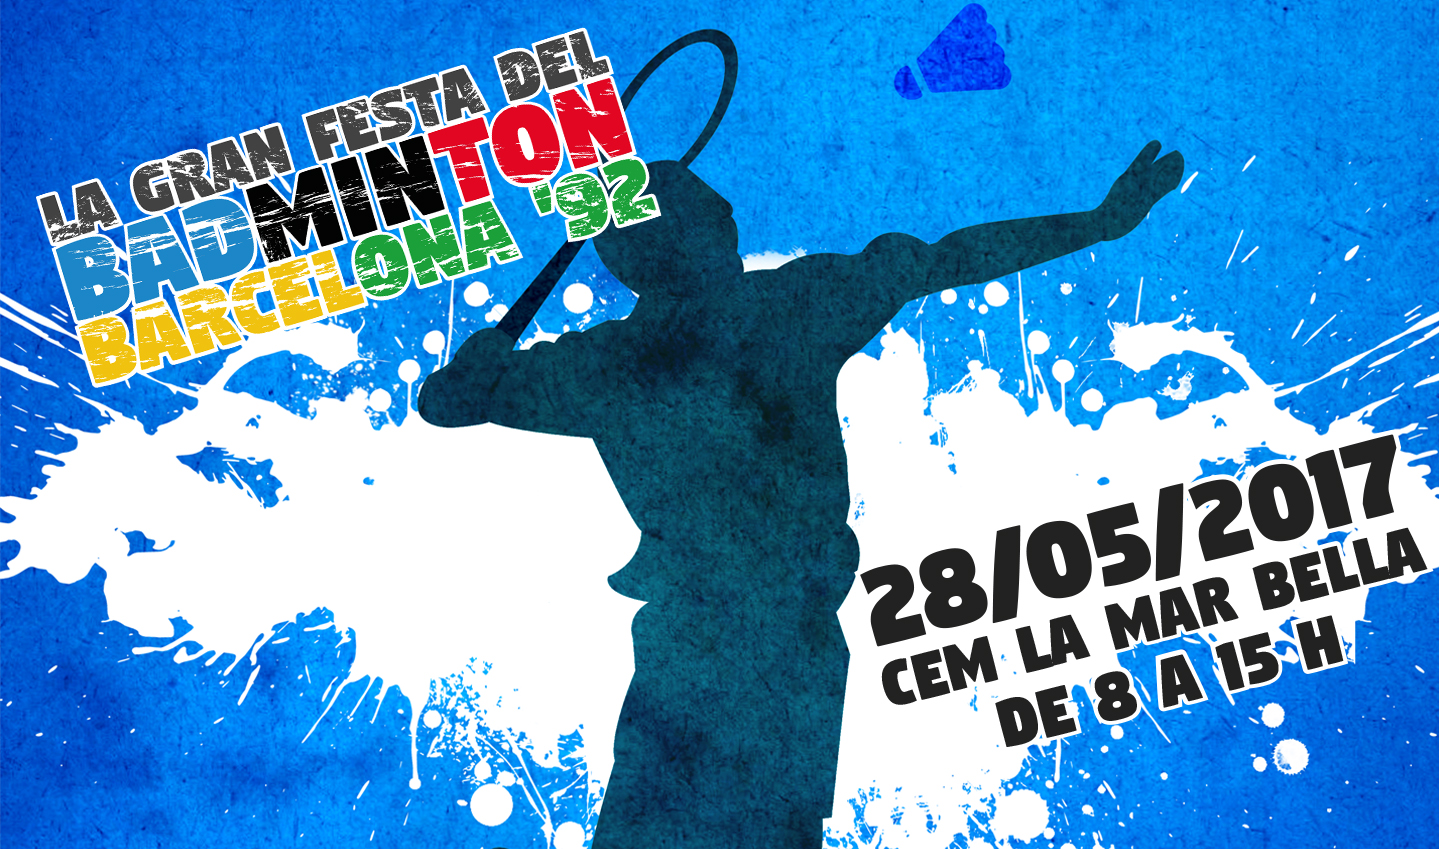 badminton barcelona 92